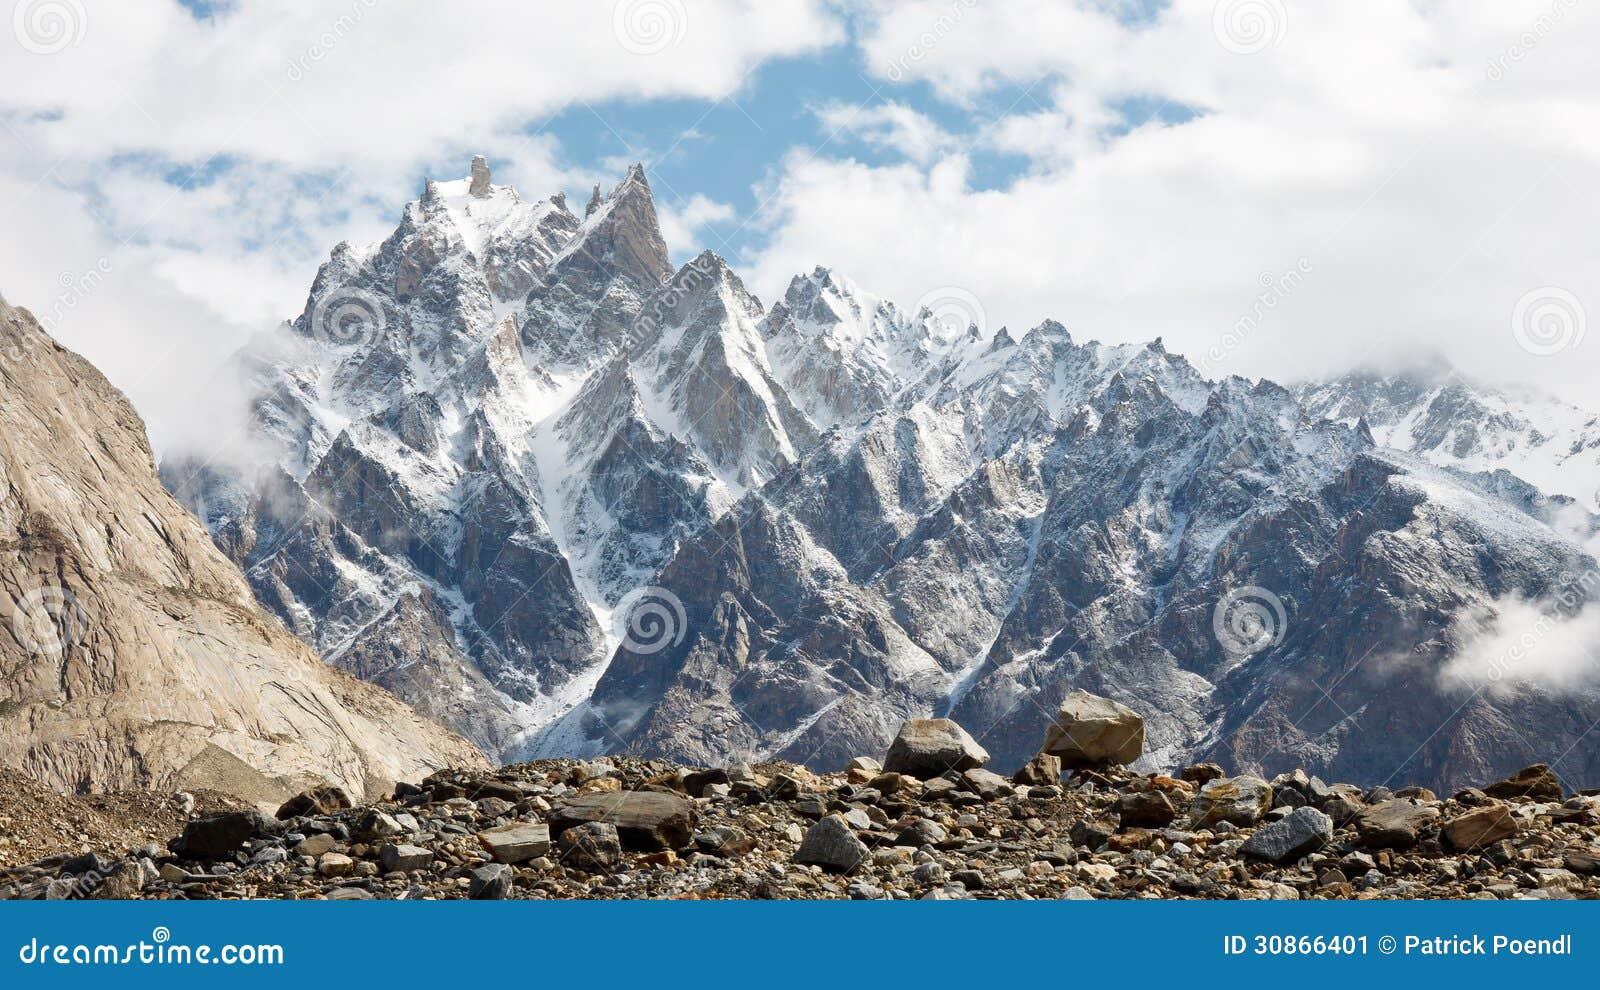 mountain ranges in pakistan pdf